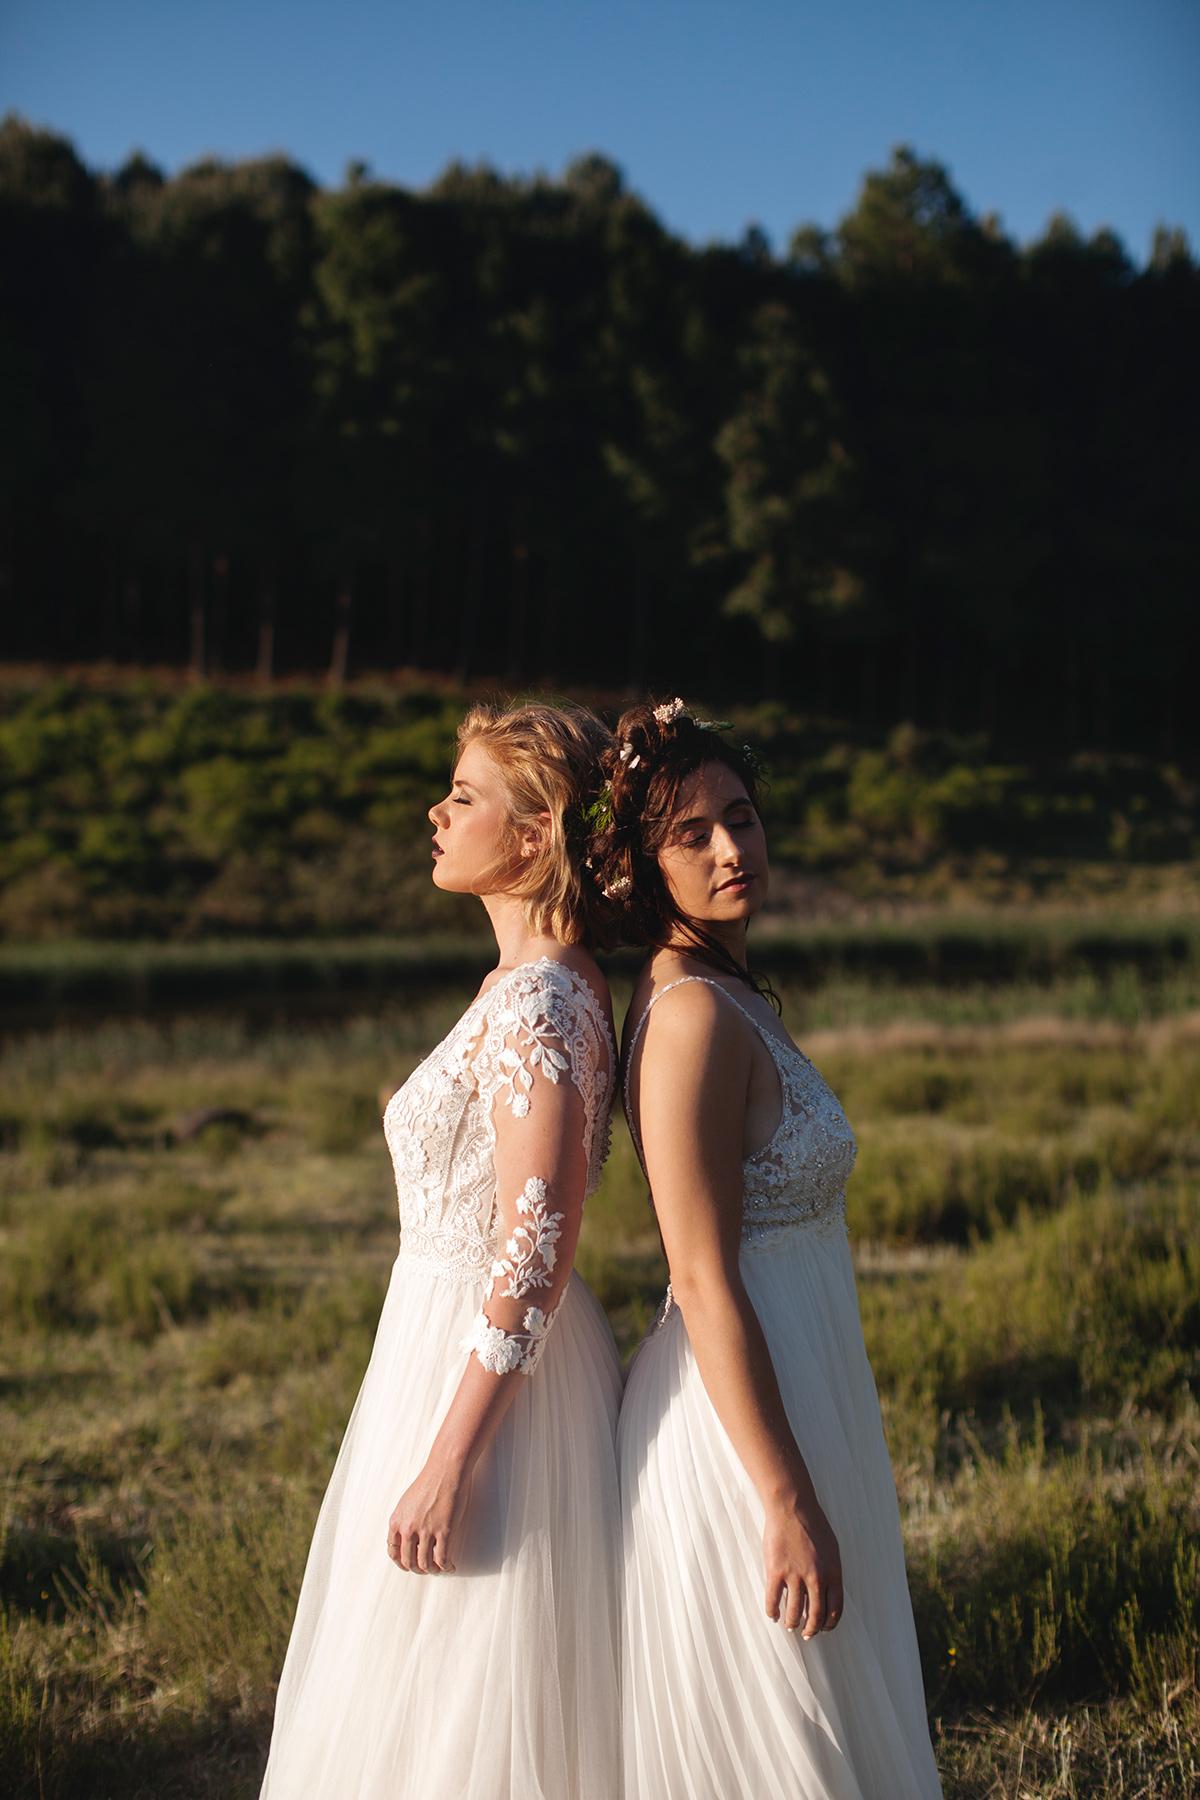 Bridal11Nov2018_HMP_Combo21.jpg